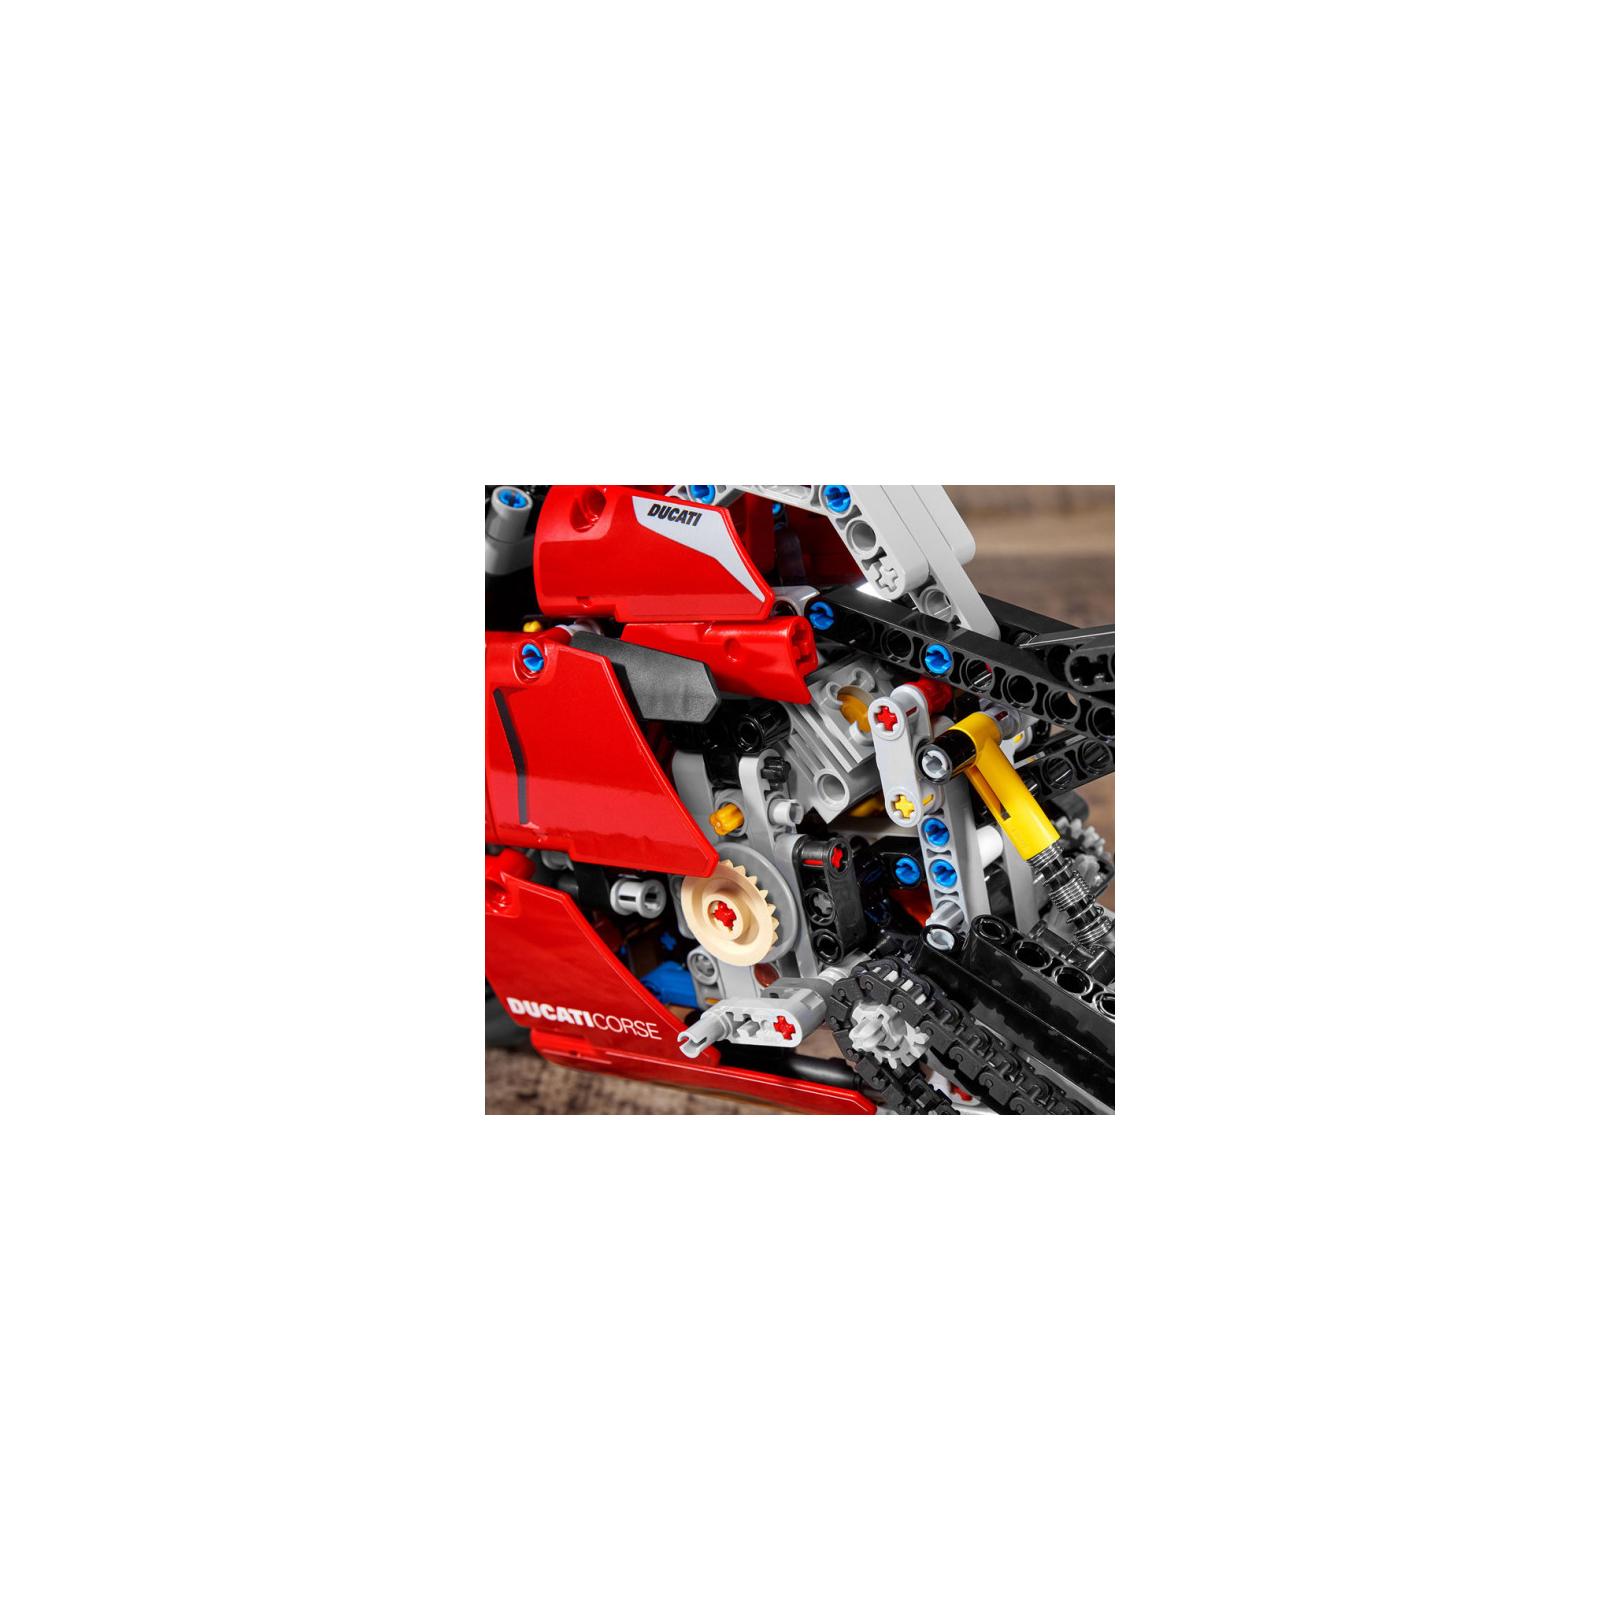 Конструктор LEGO Technic Ducati Panigale V4 R 0 646 детали (42107) изображение 9